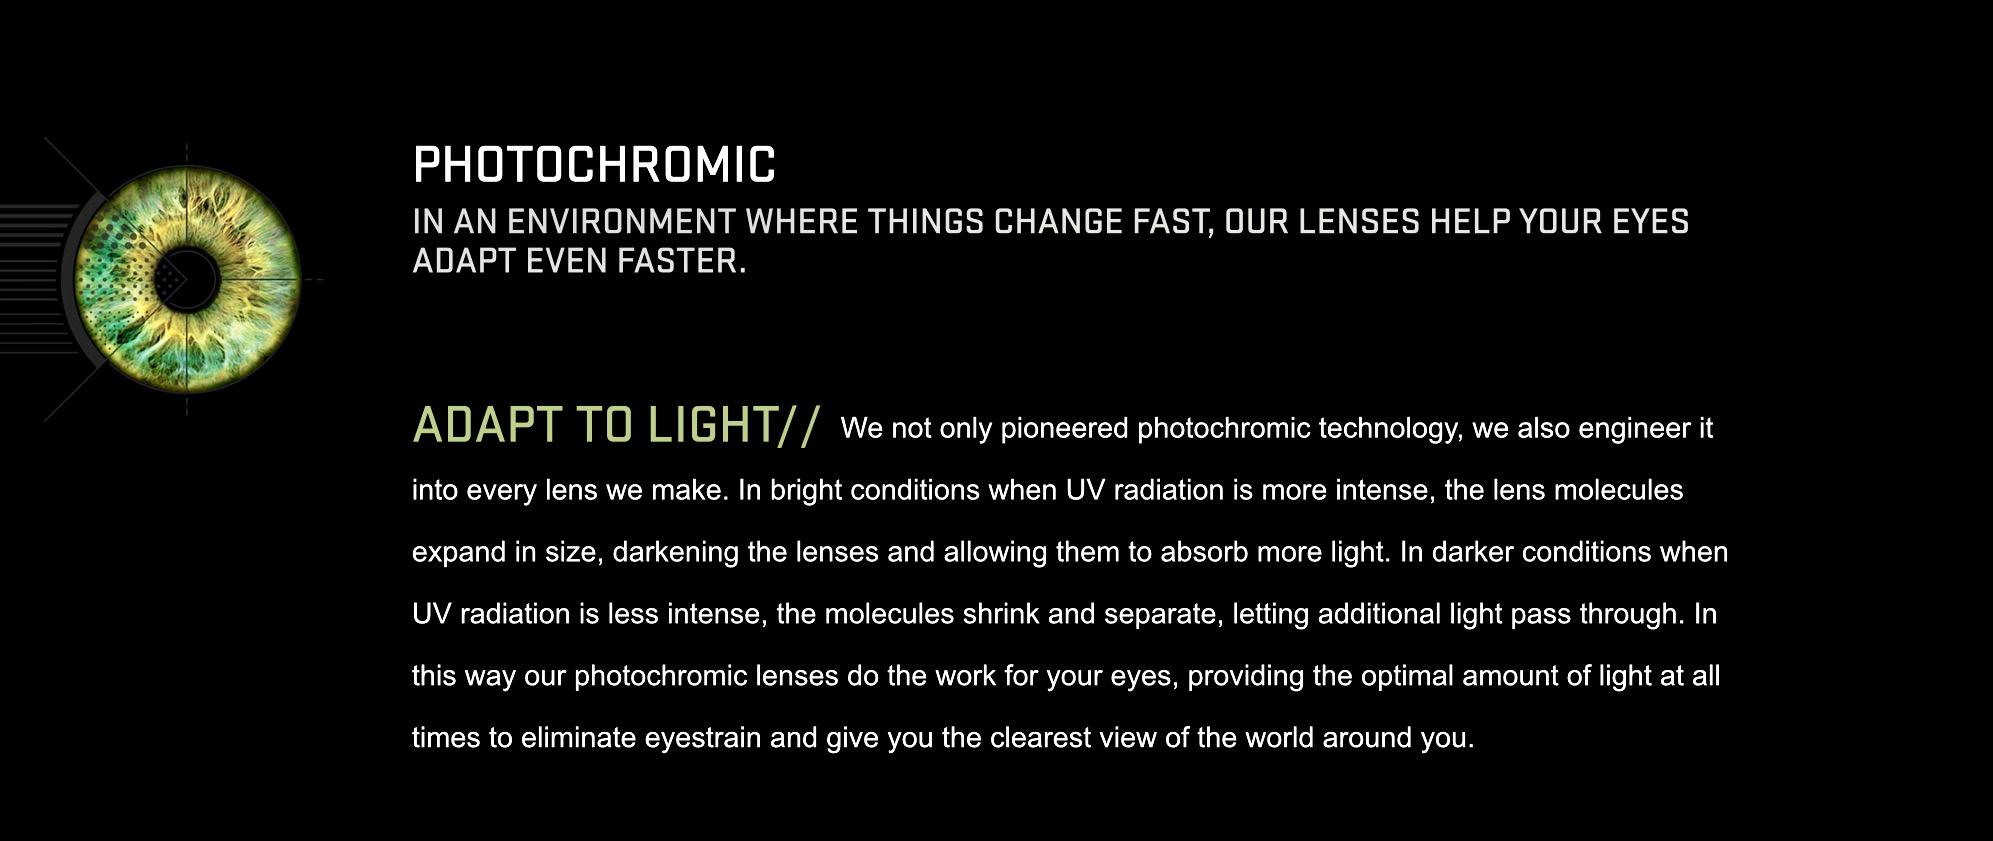 Serengeti prescription sunglasses photochromic technology